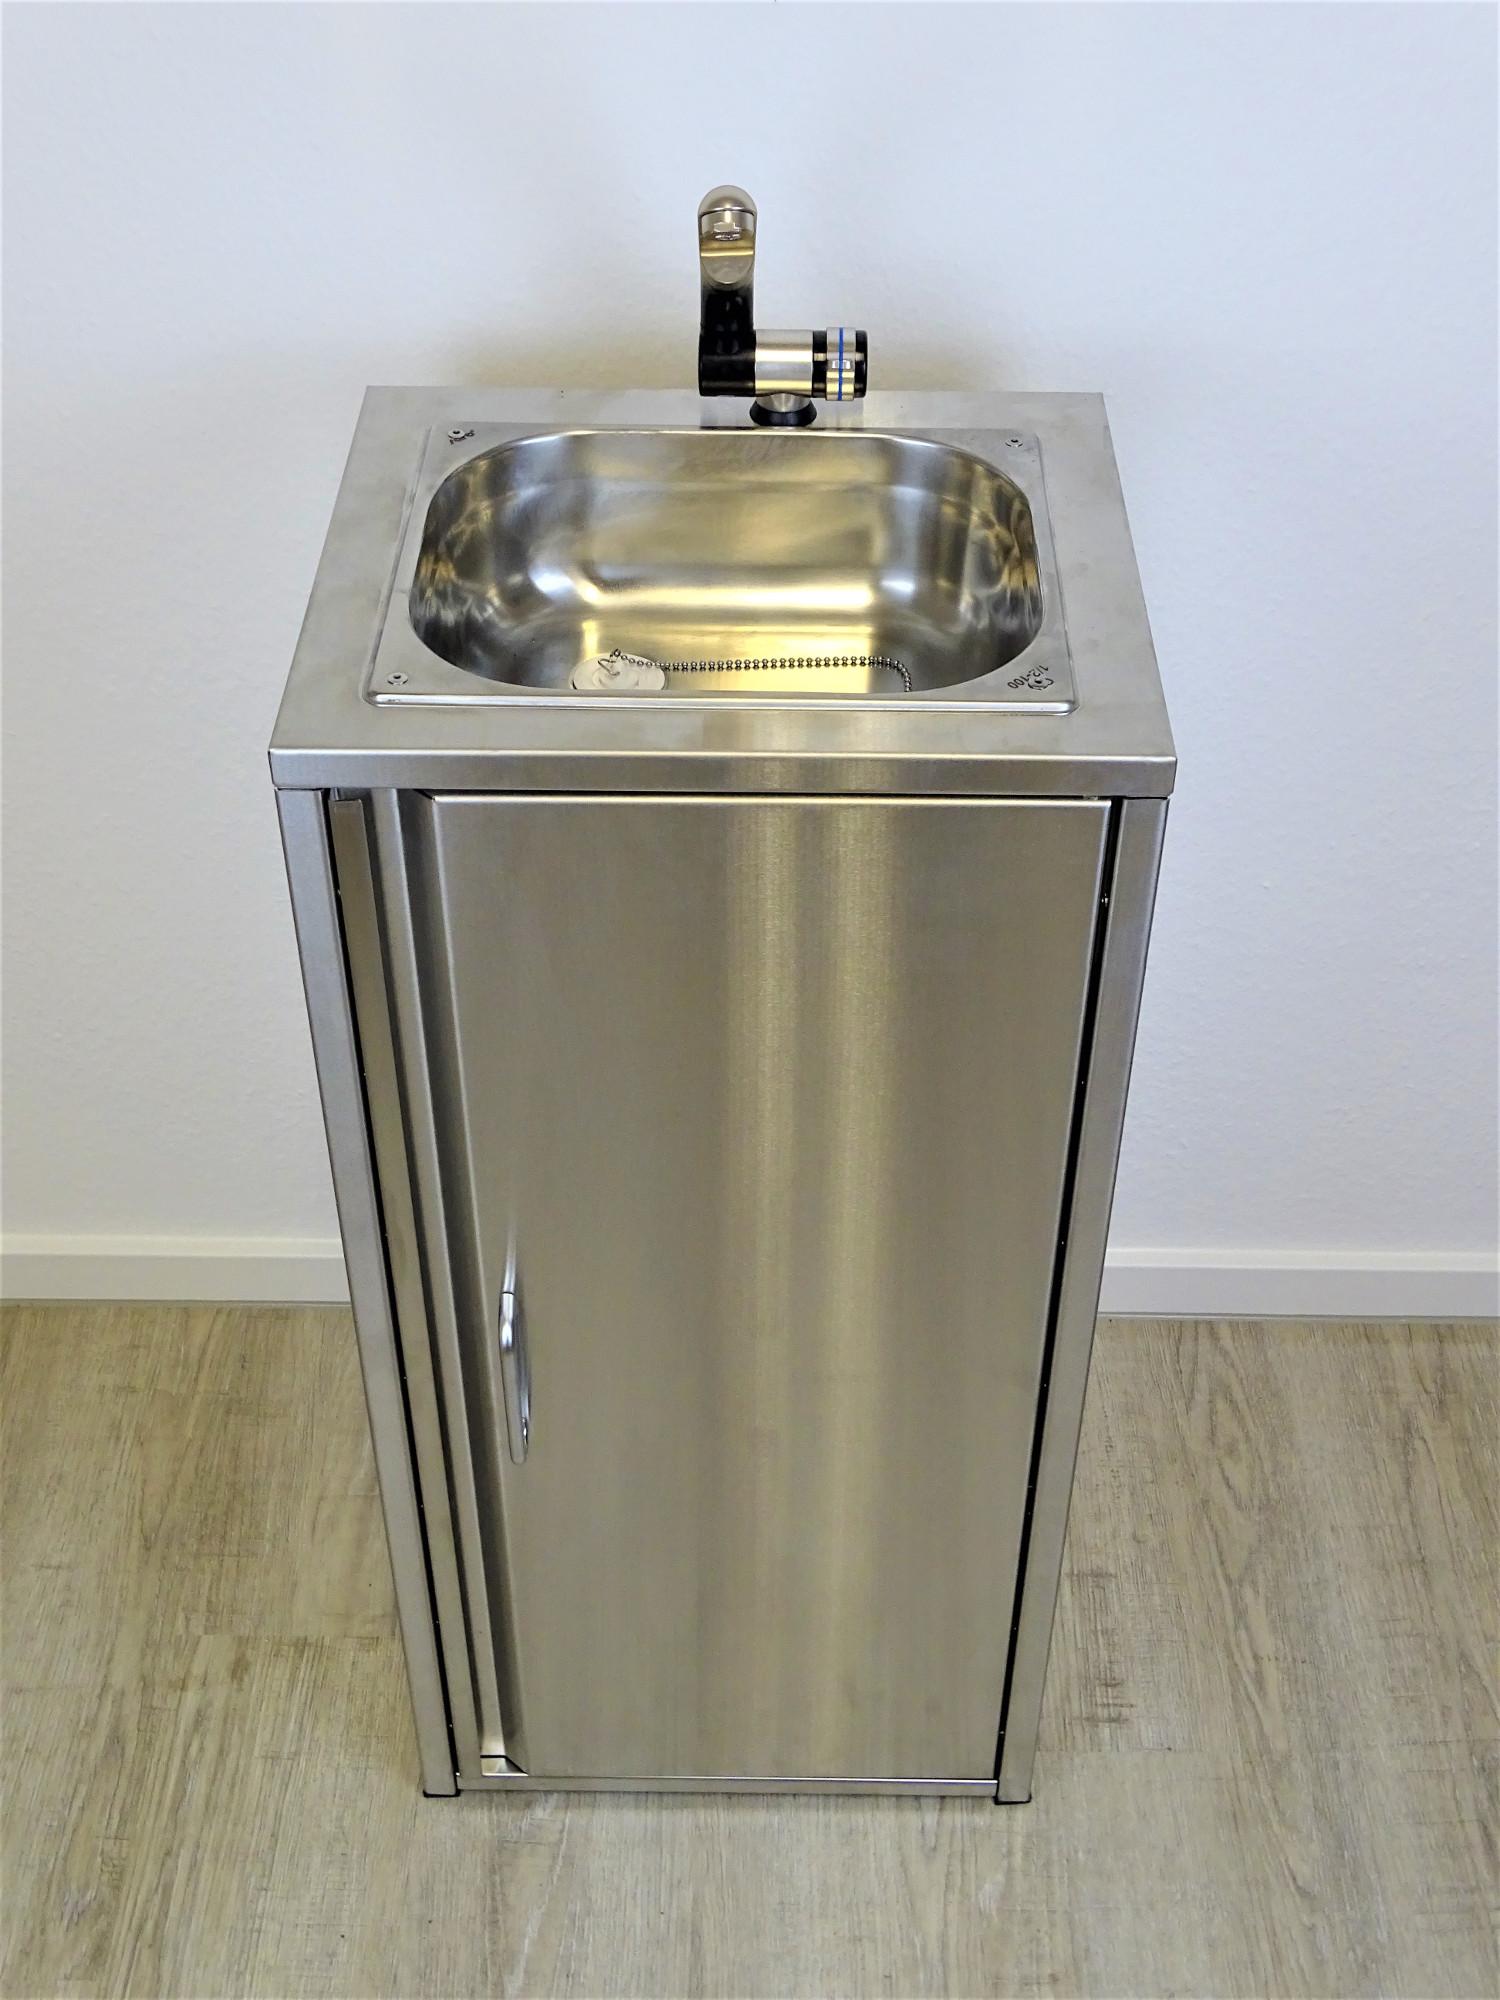 mobiles waschbecken sp lbecken handwaschbecken camping komplett aus edelstahl ebay. Black Bedroom Furniture Sets. Home Design Ideas